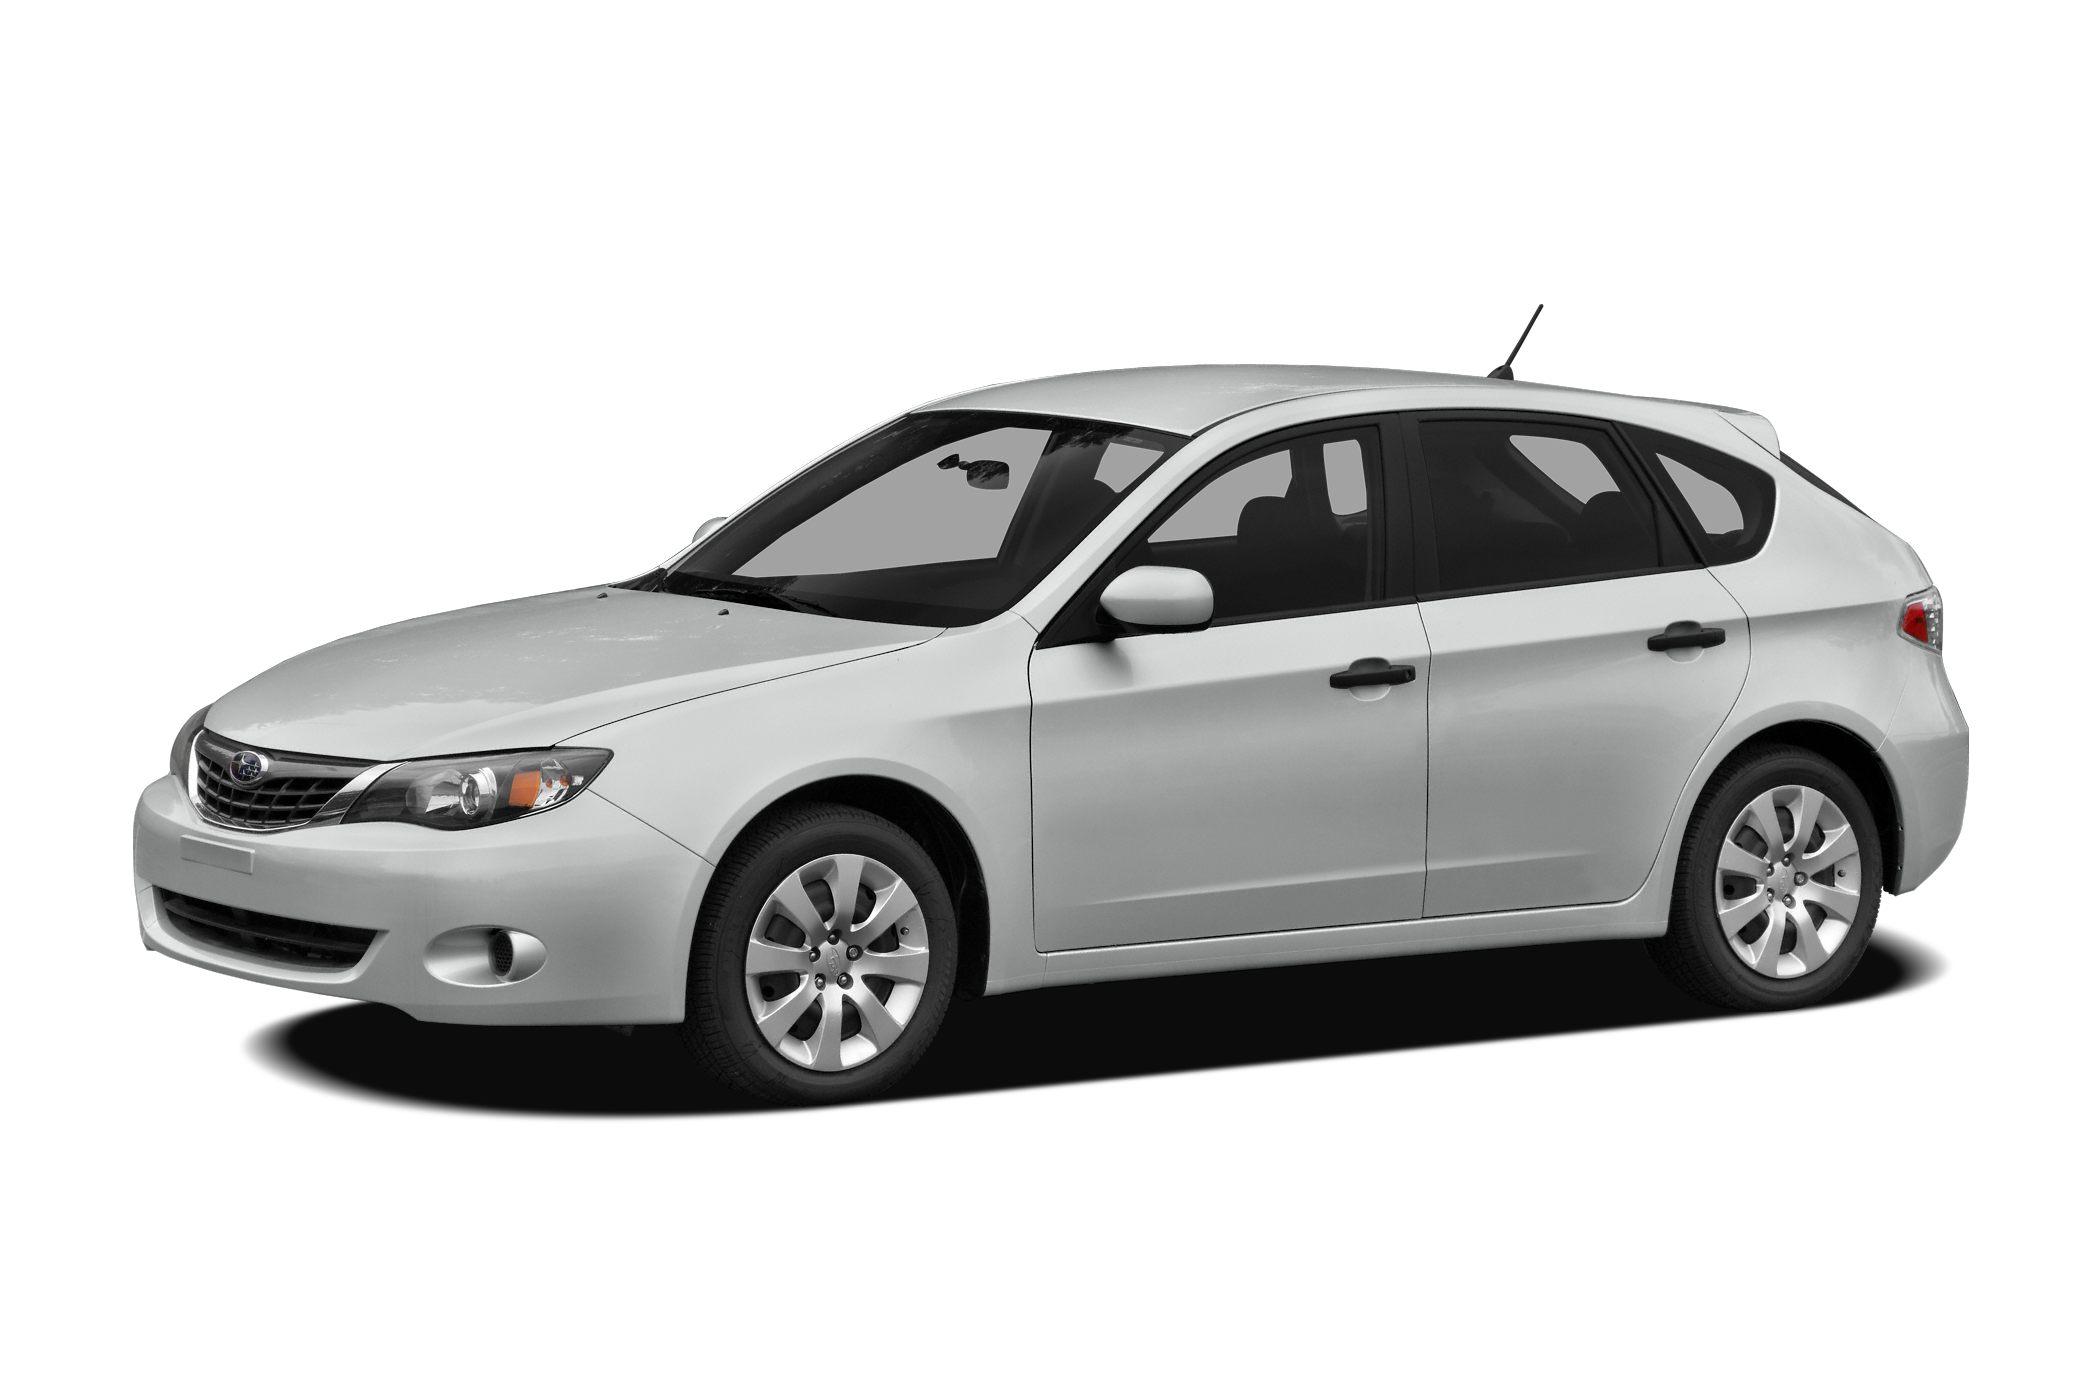 2008 Subaru Impreza Safety Features